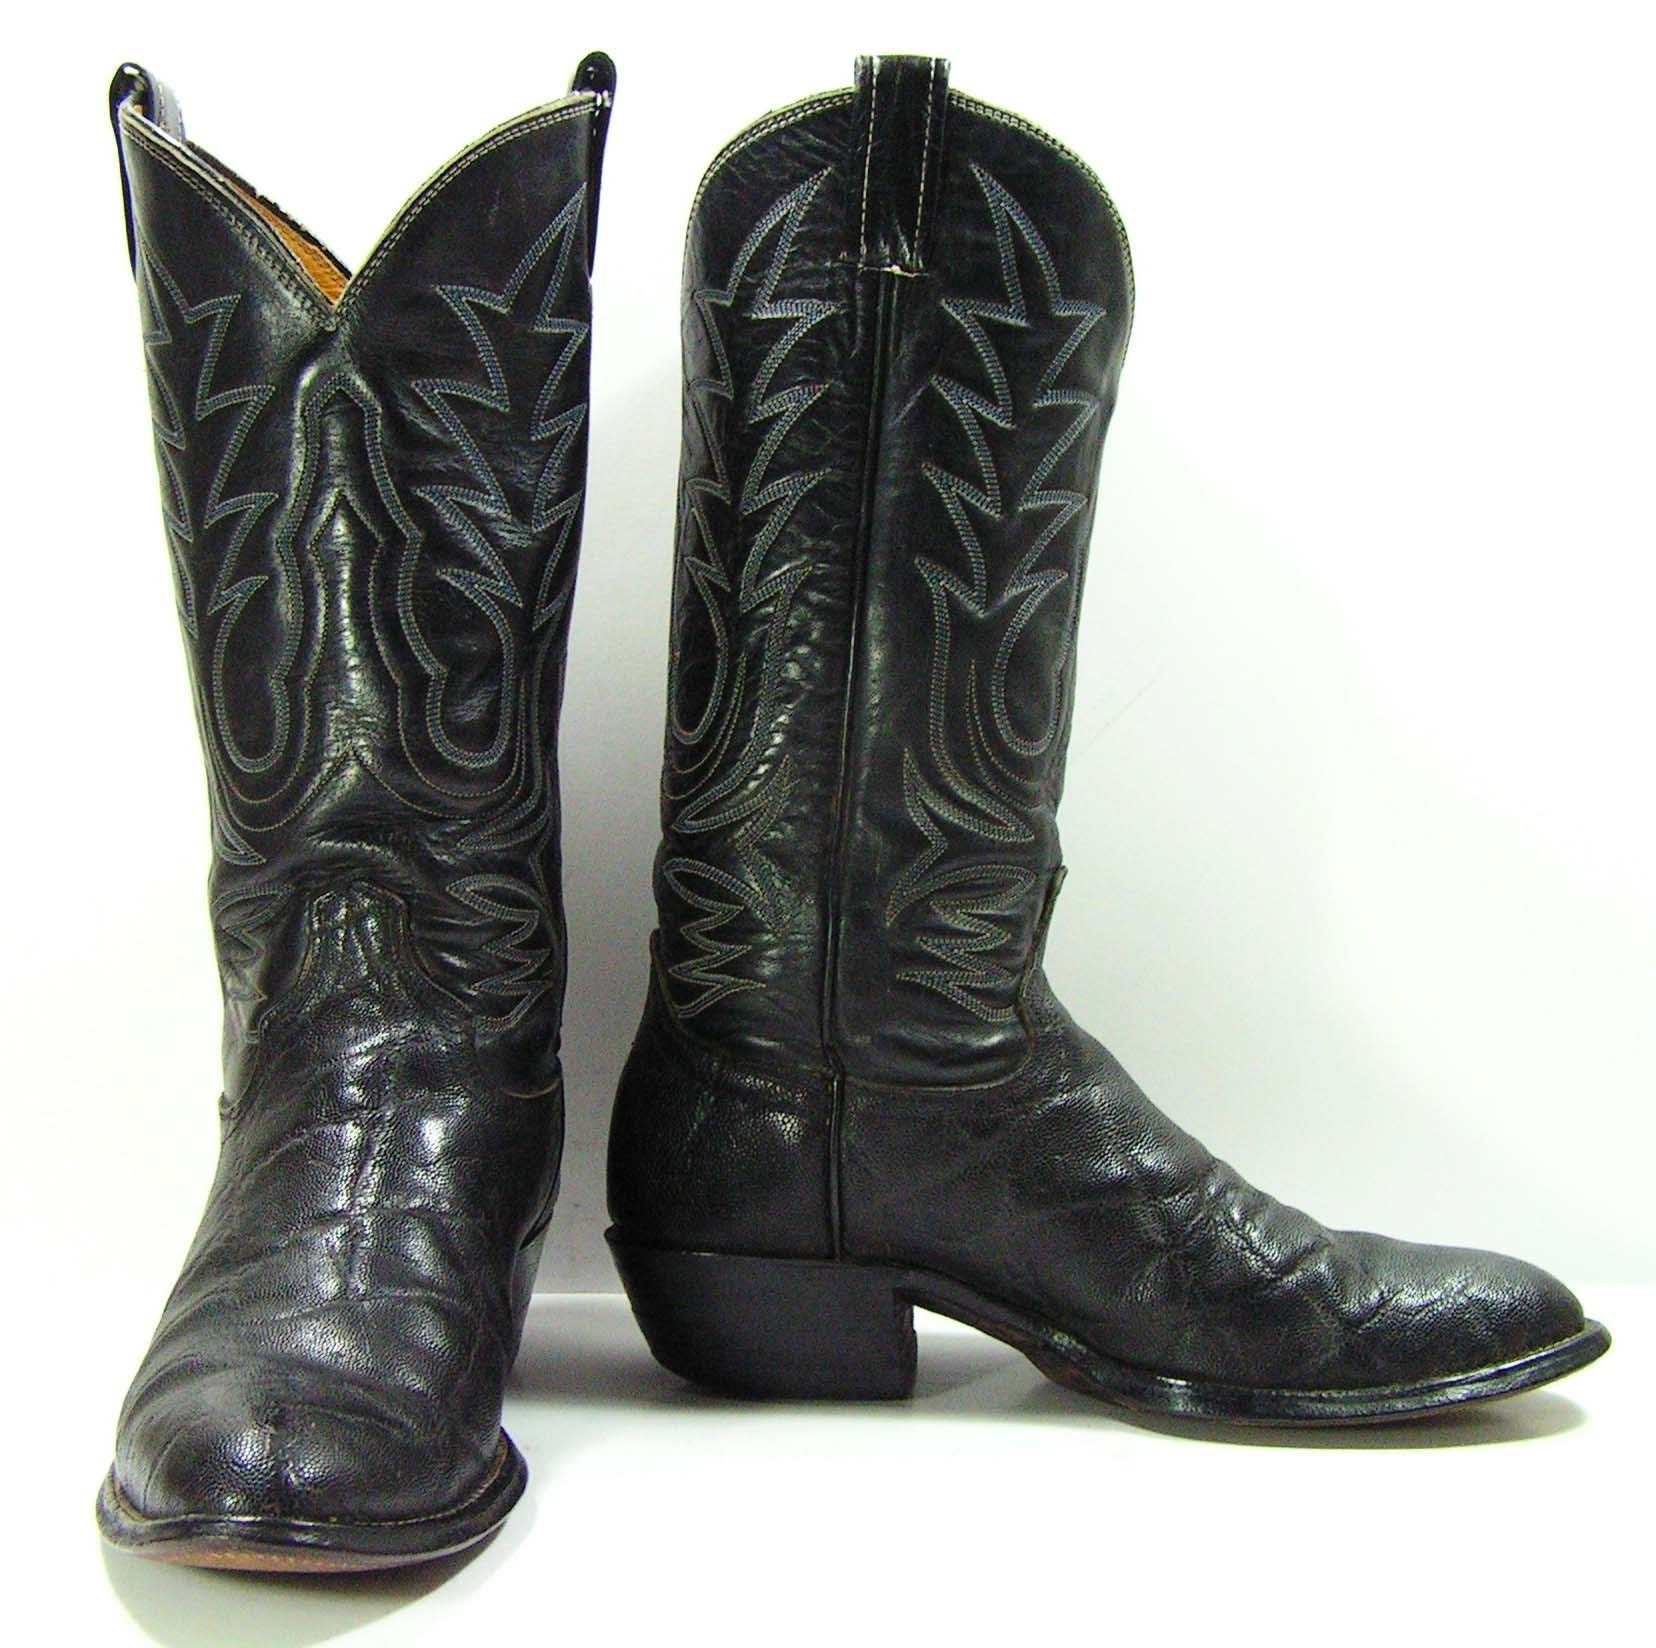 Vintage Cowboy Boots Mens 9 D Black Western Elephant Skin